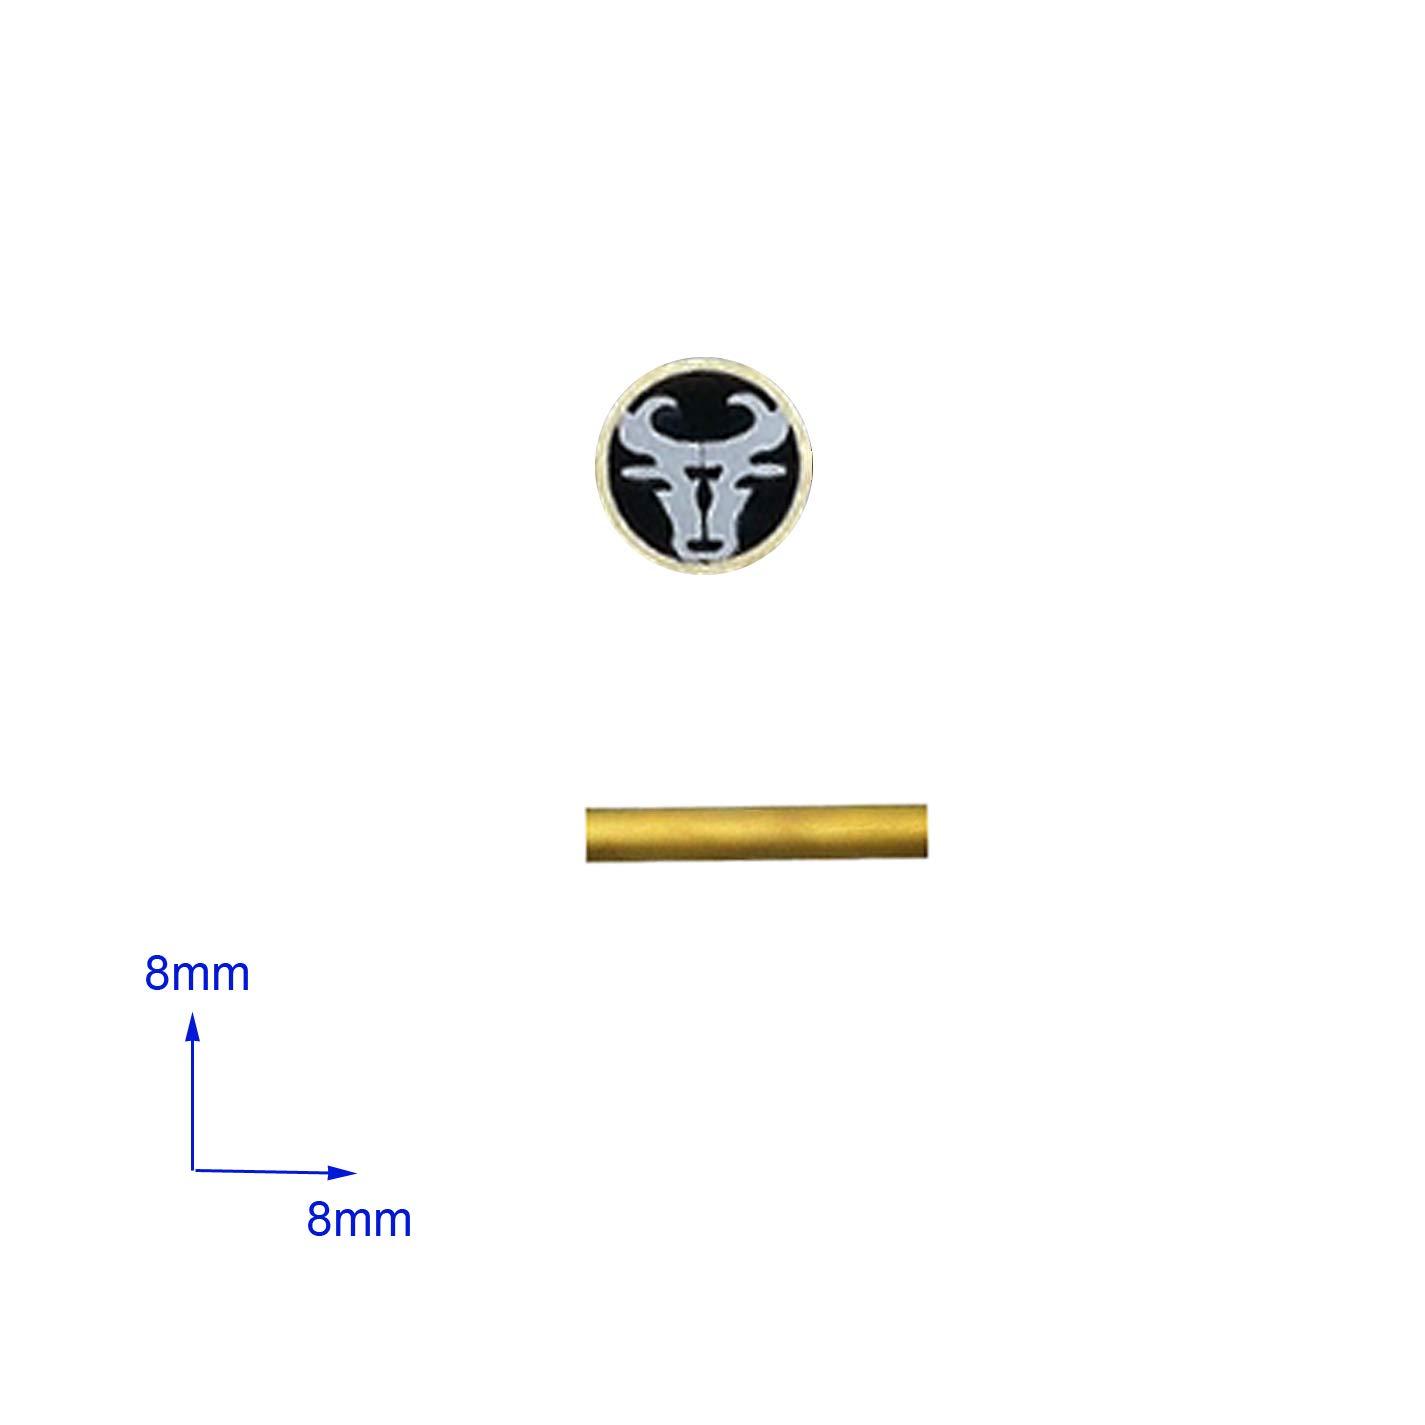 Bolzen aus Mosaiken Nieten f/ür den Messergriff 5mm, Bumerang Jagdmesser Befestigungsst/ücke Mosaikschrauben L/änge 4,5cm